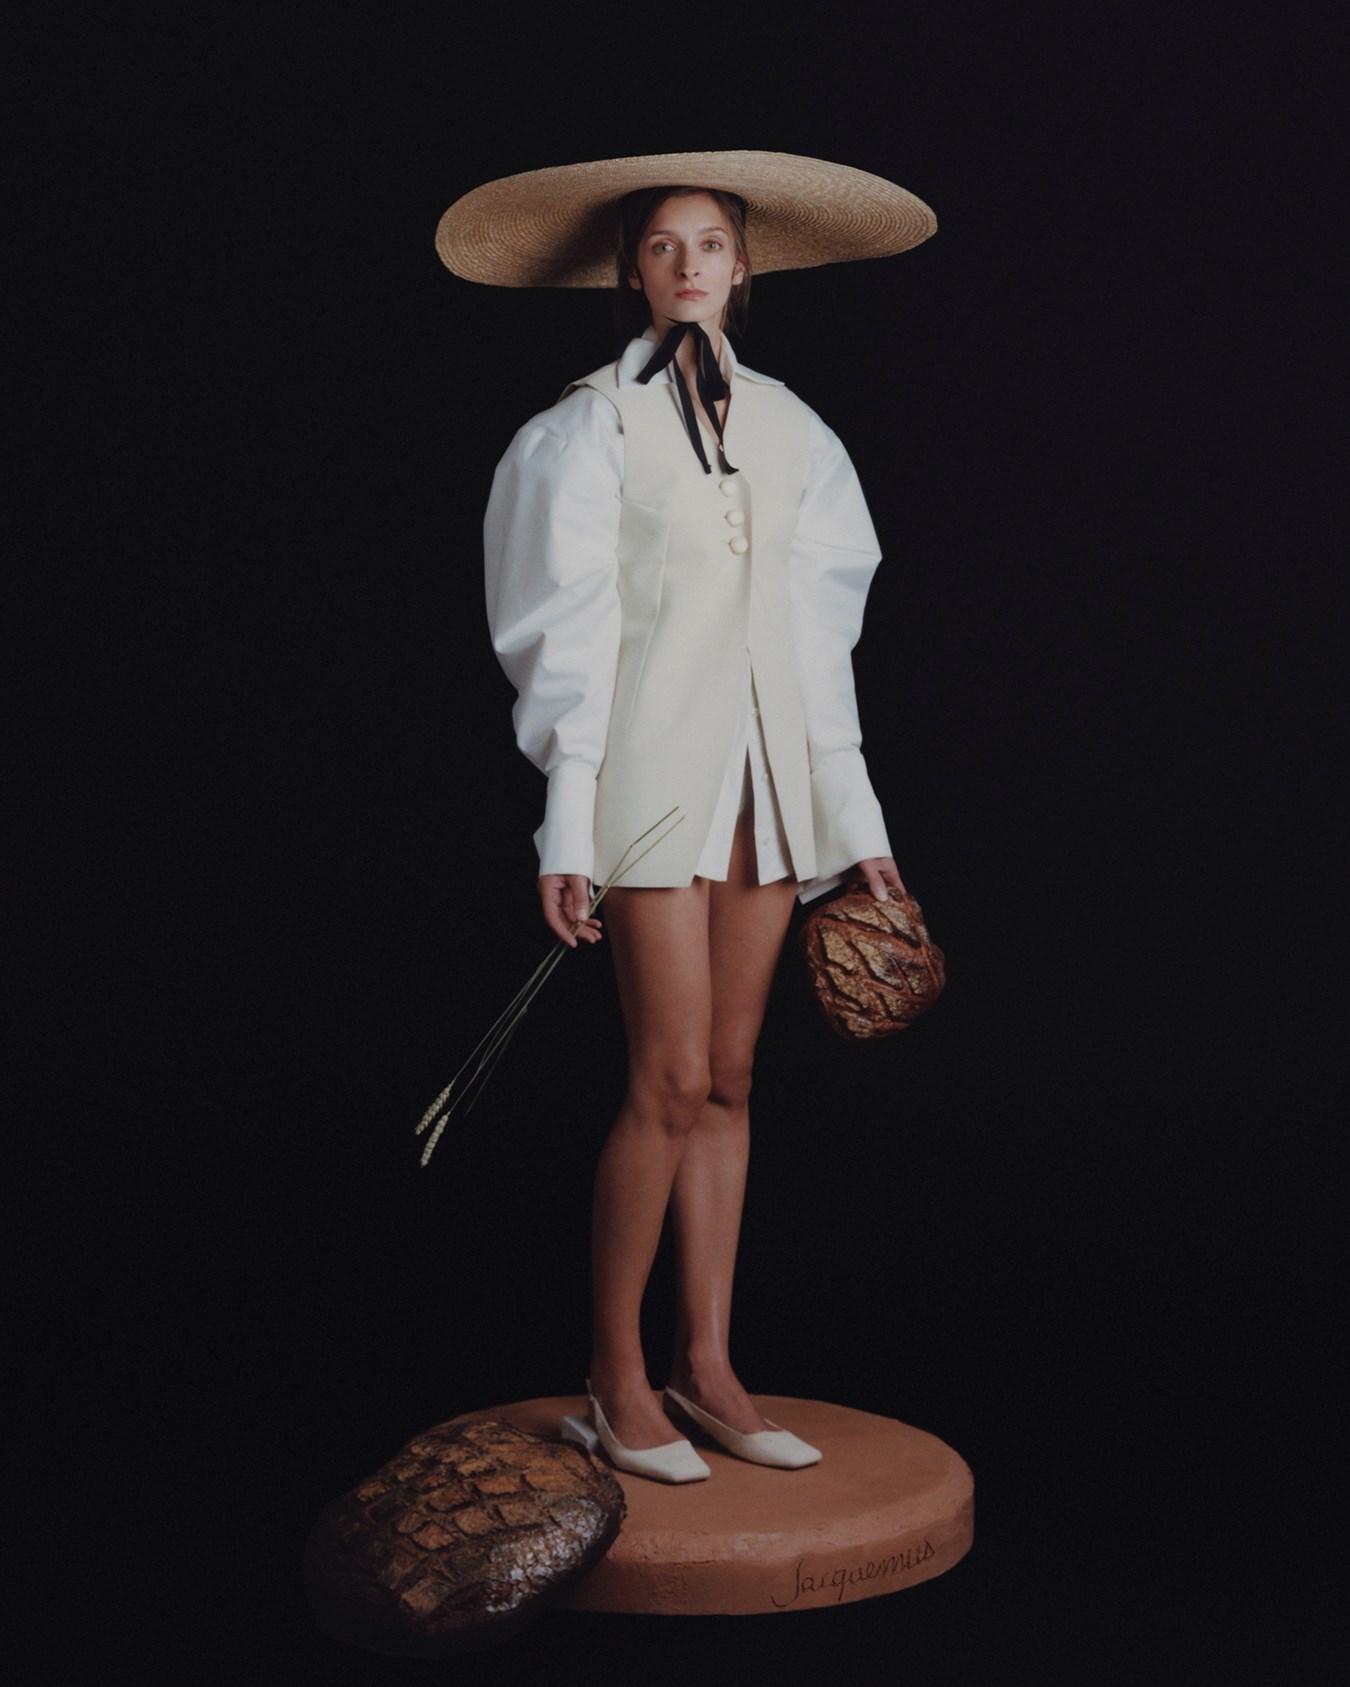 La Femme au Pain (The Woman with Bread) Photography David Luraschi, artistic direction Simon Porte Jacquemus